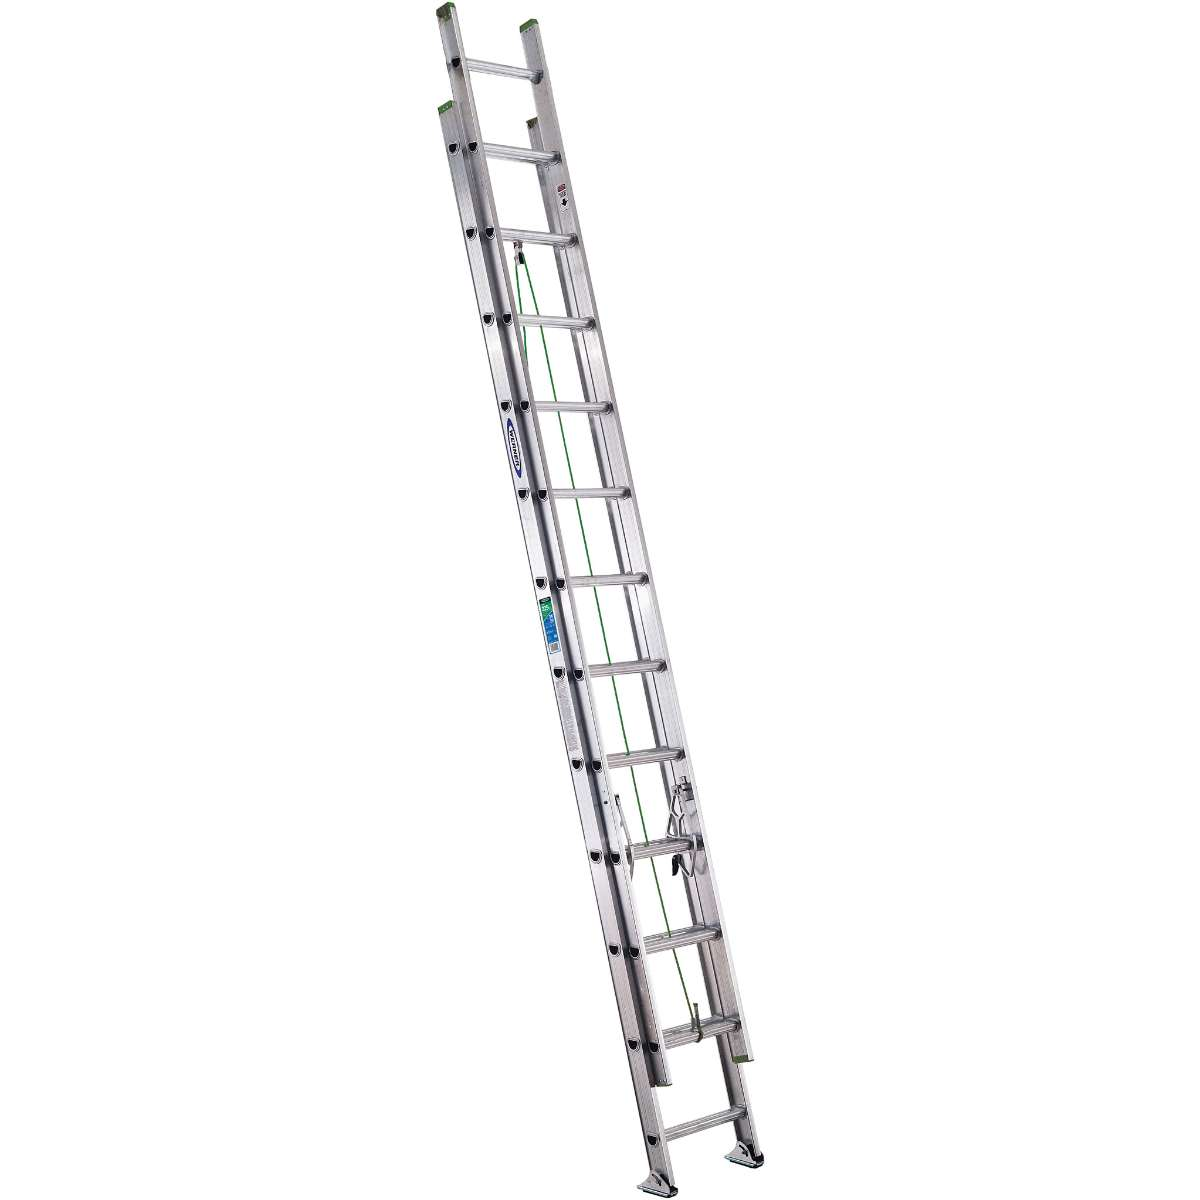 Werner Flat Step Extension Ladder 225 Lb Capacity D1200 2